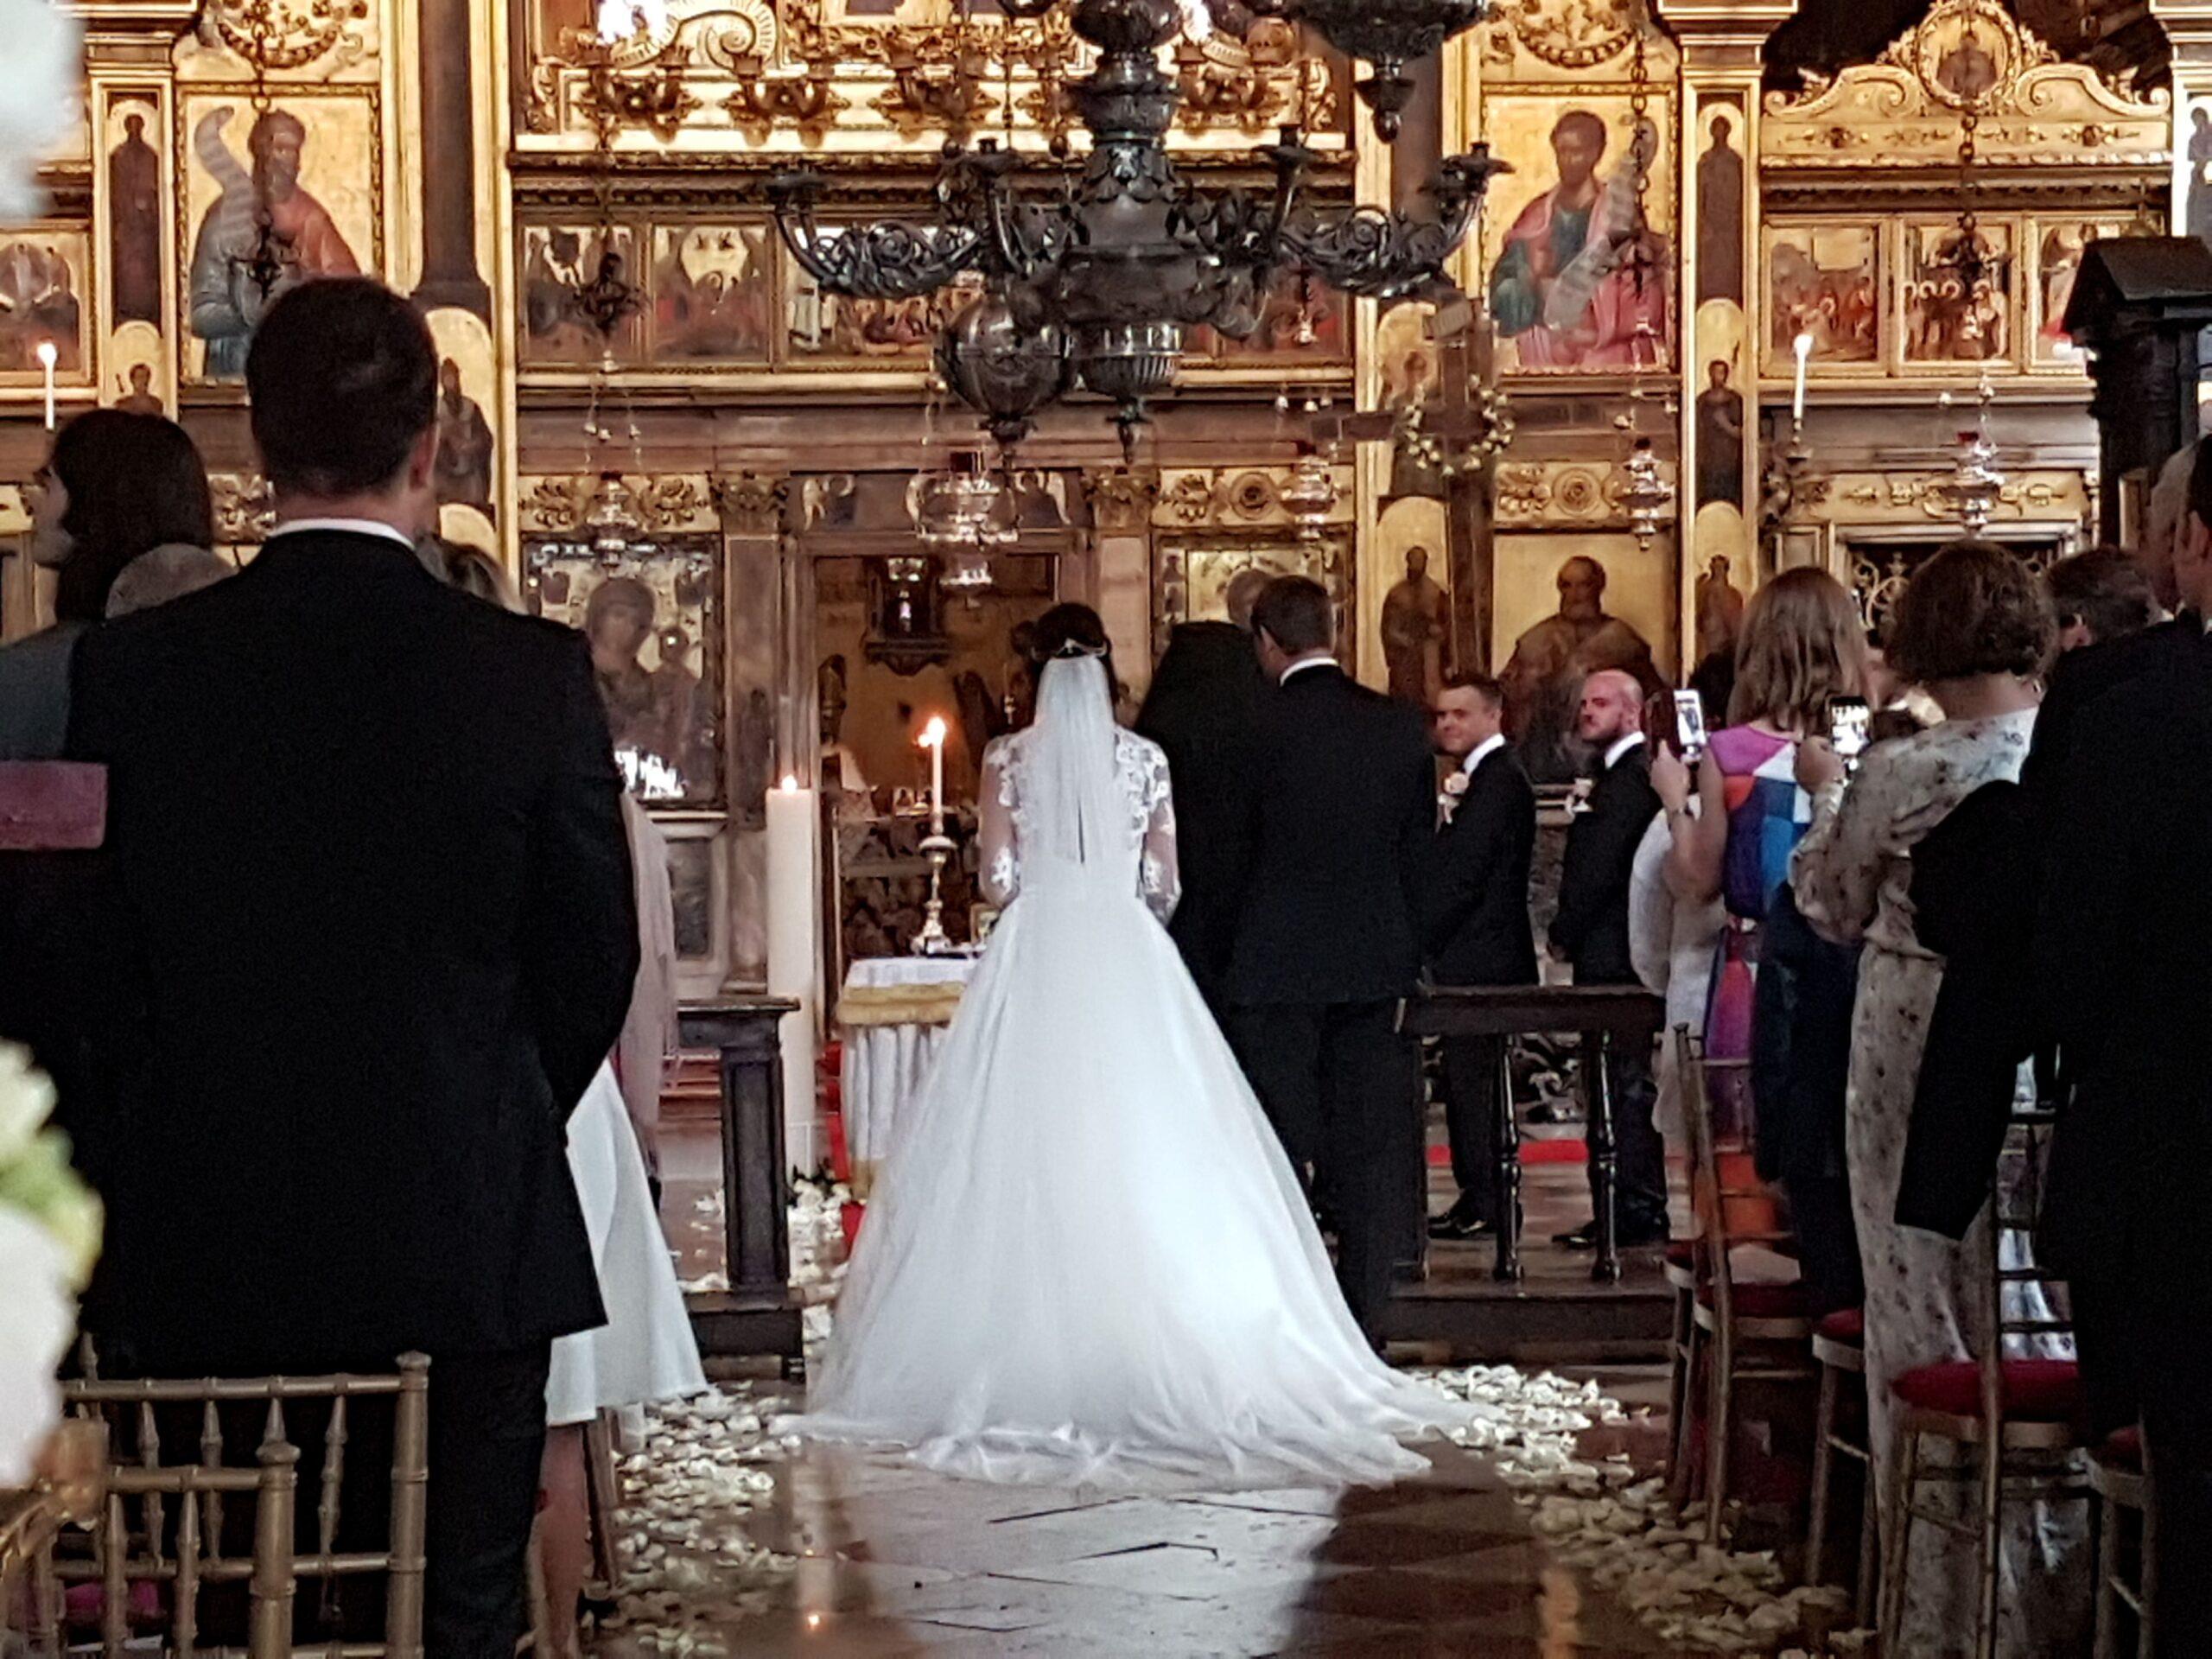 Orthodox Bride Wedding Abroad in Venice Italy WeddingsAbroad.com